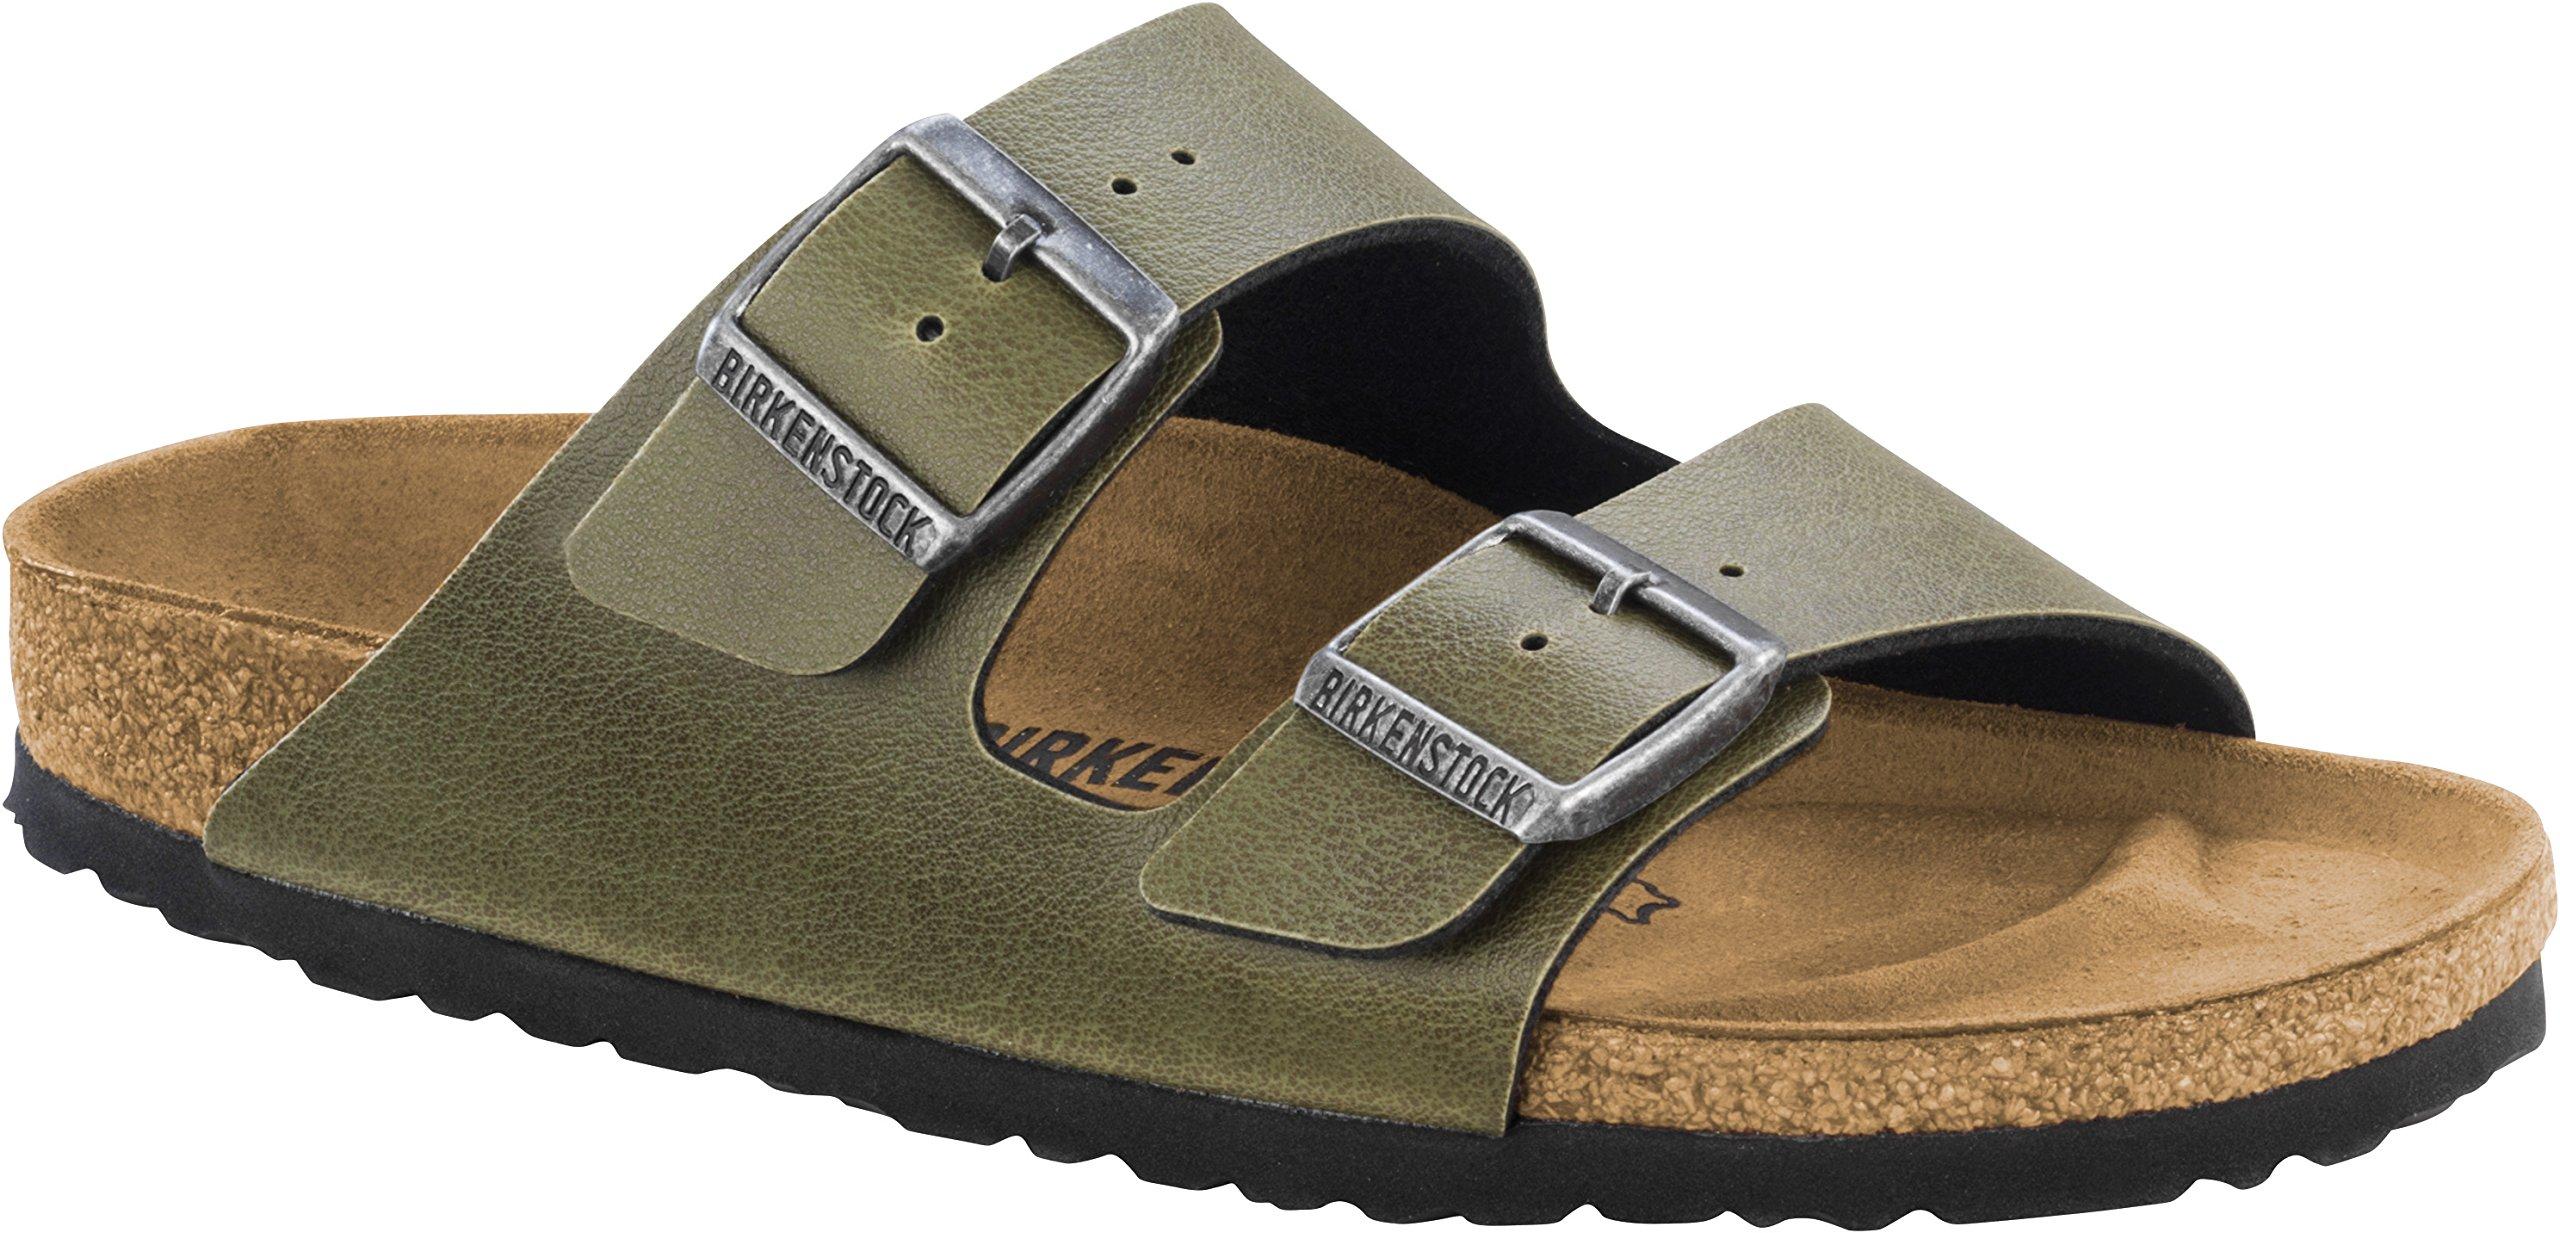 Birkenstock Unisex Arizona Olive Birko-Flor Pull Up Sandal